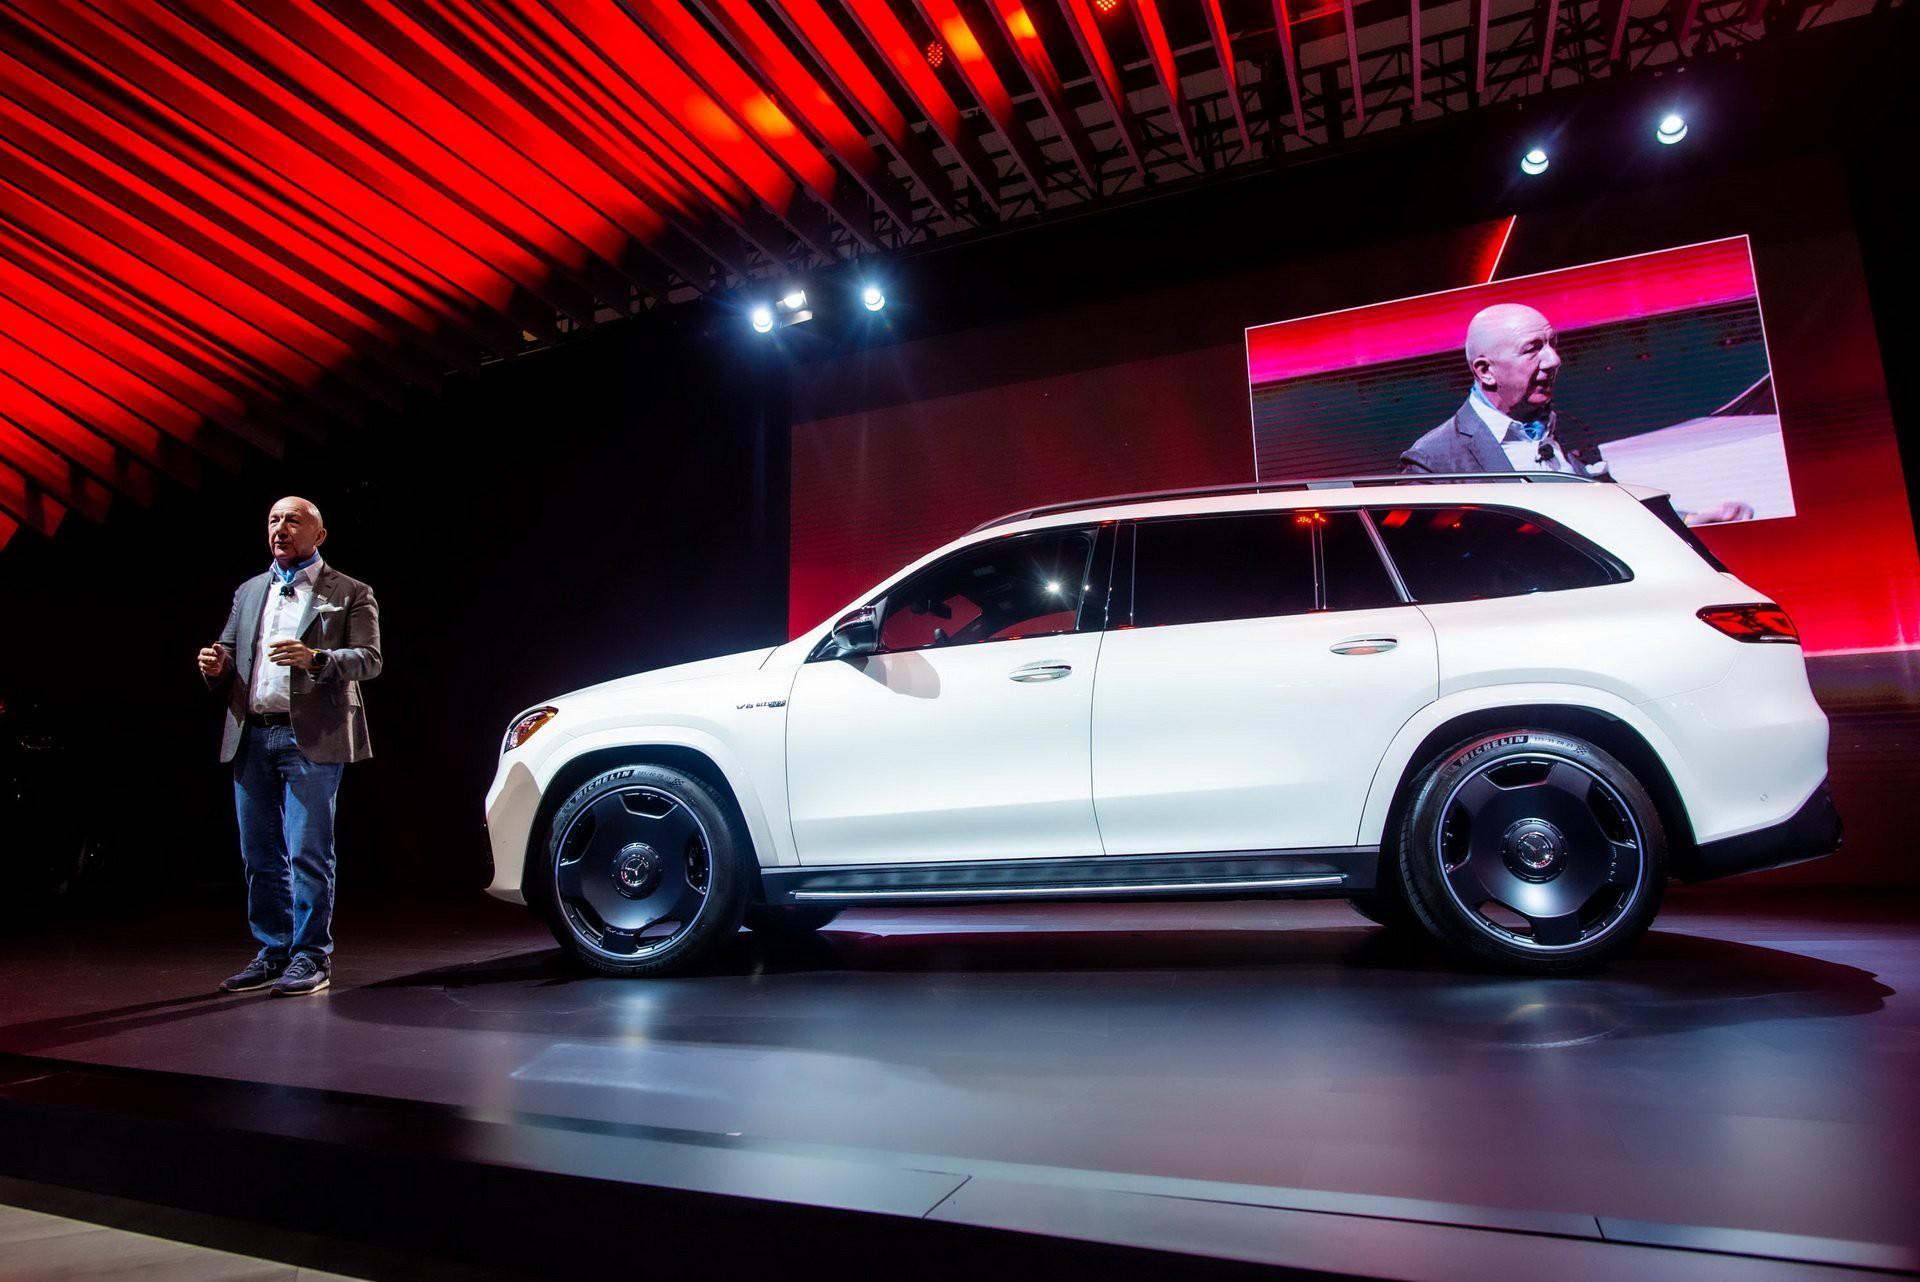 Khám phá Mercedes GLS 63 2020 vừa ra mắt Ảnh 2